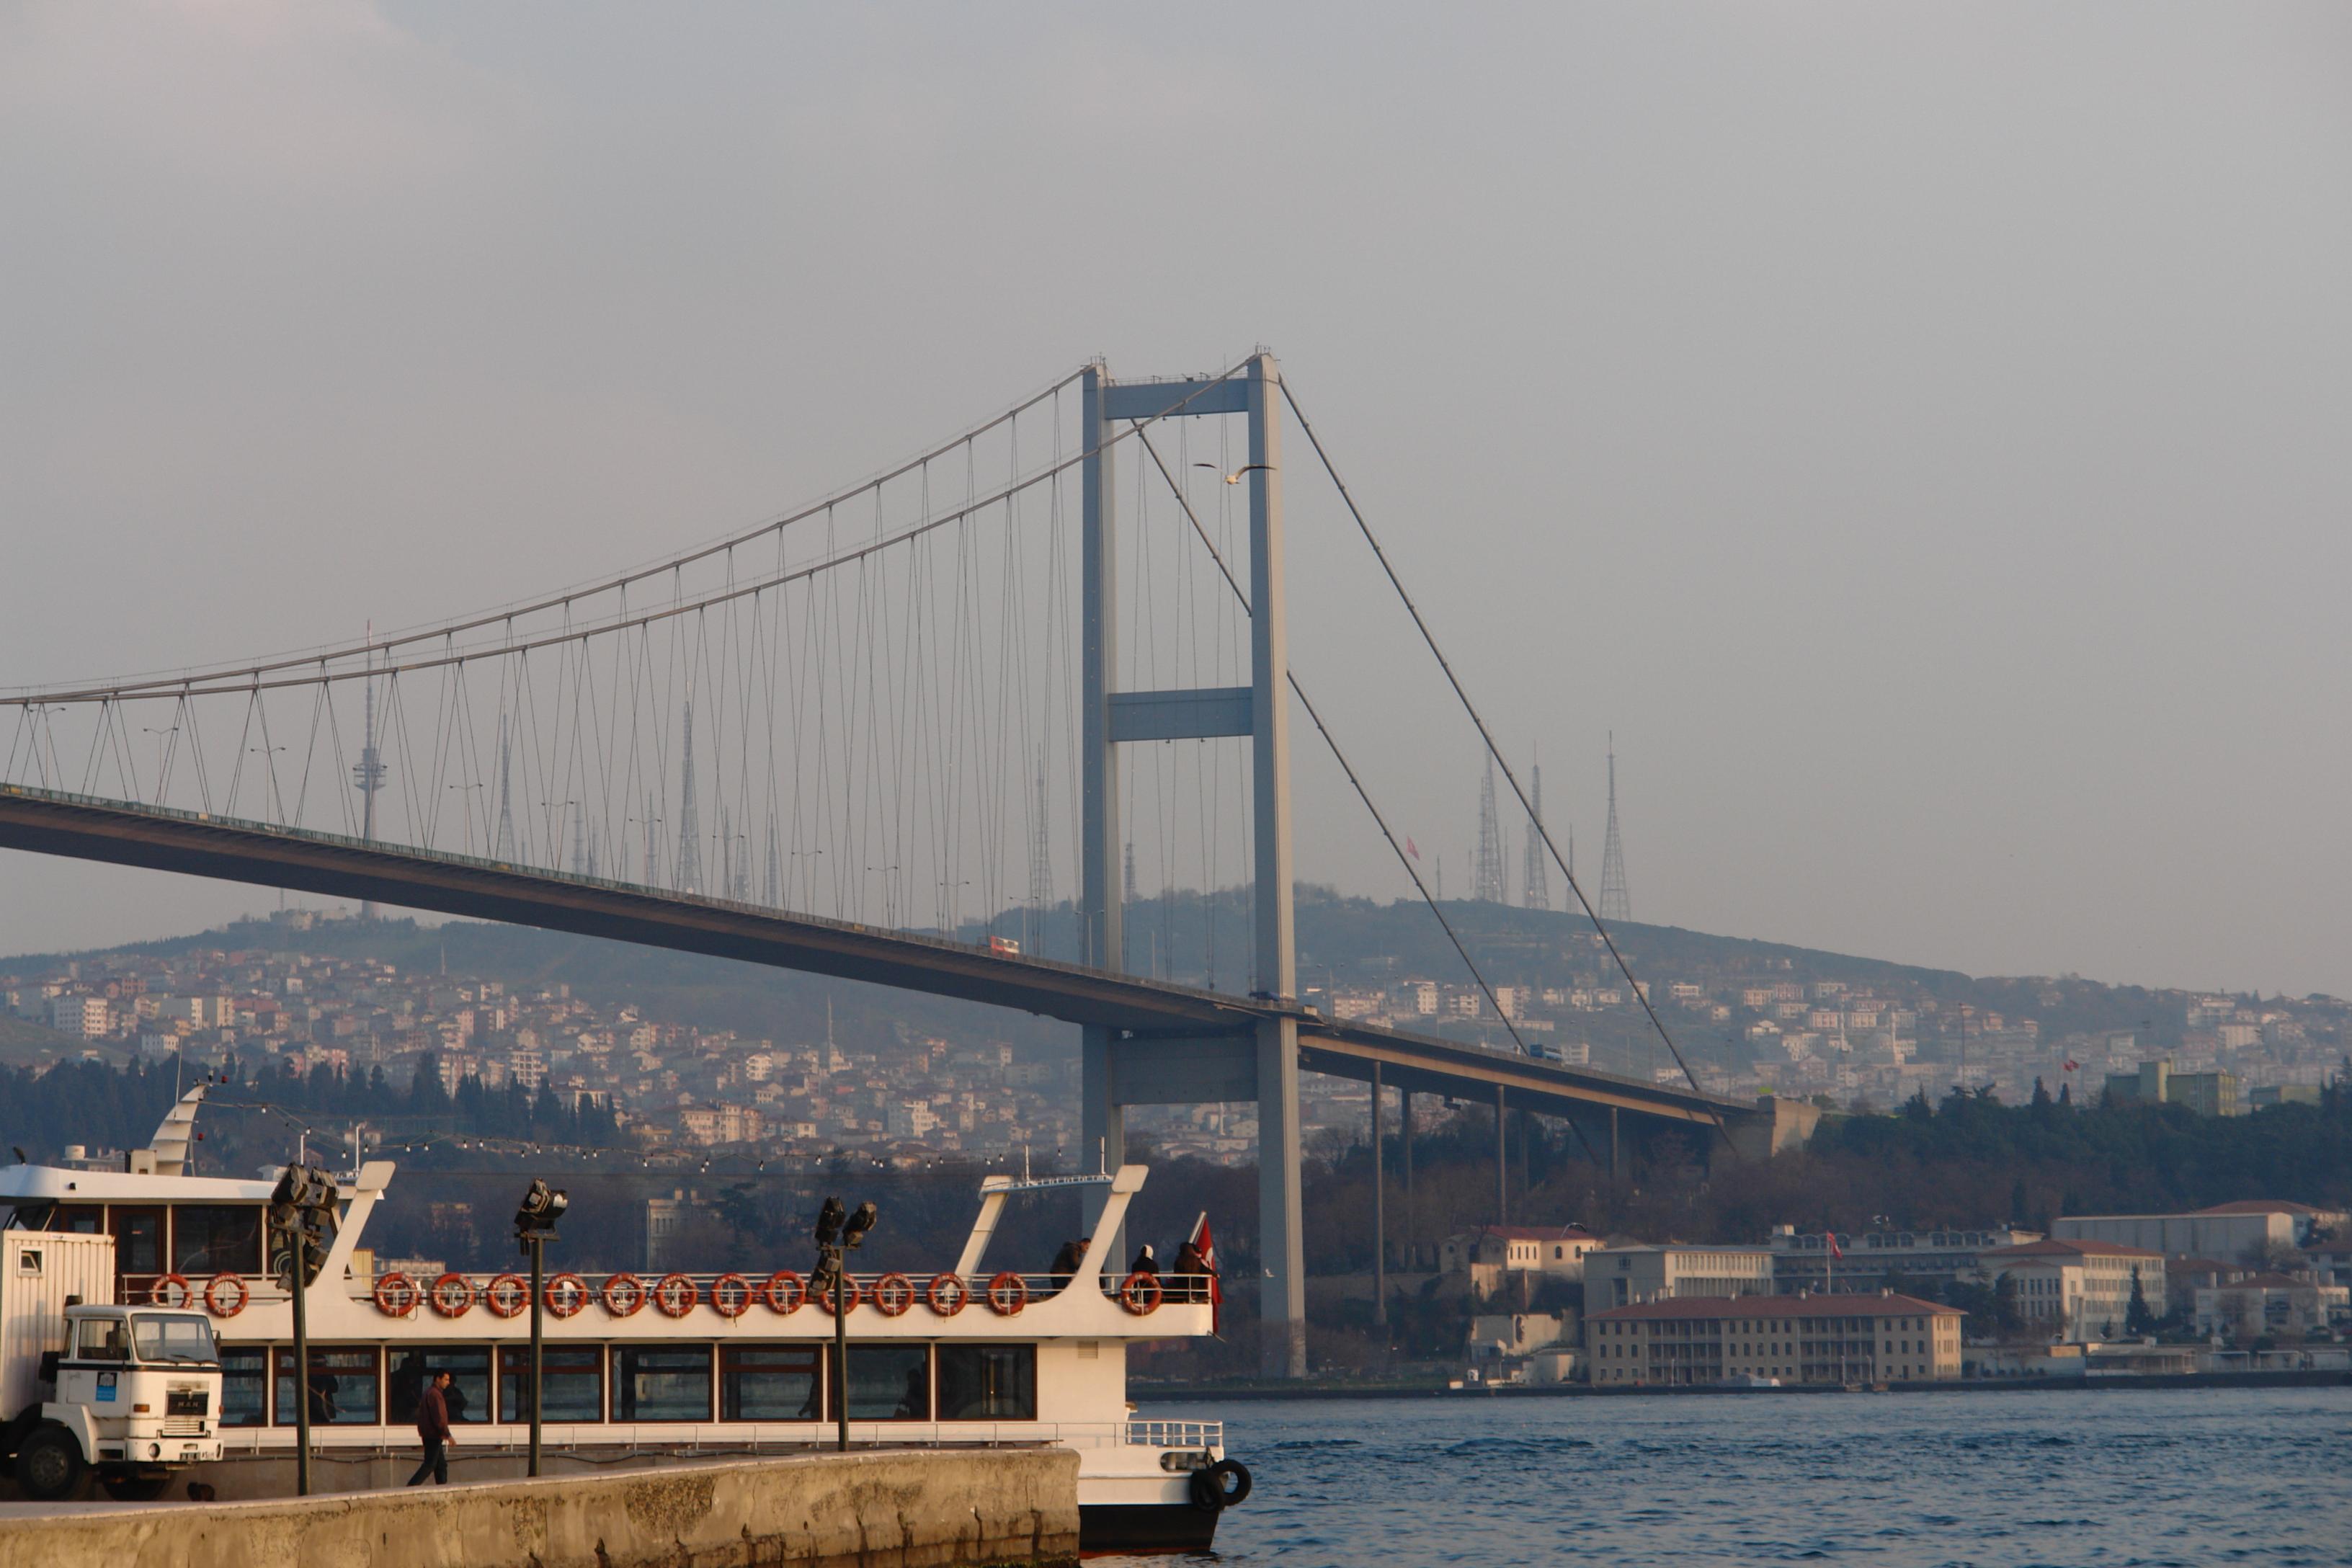 Istanbul Bosphorus Bridge, Boat, Bosphorus, Bridge, Cityscape, HQ Photo